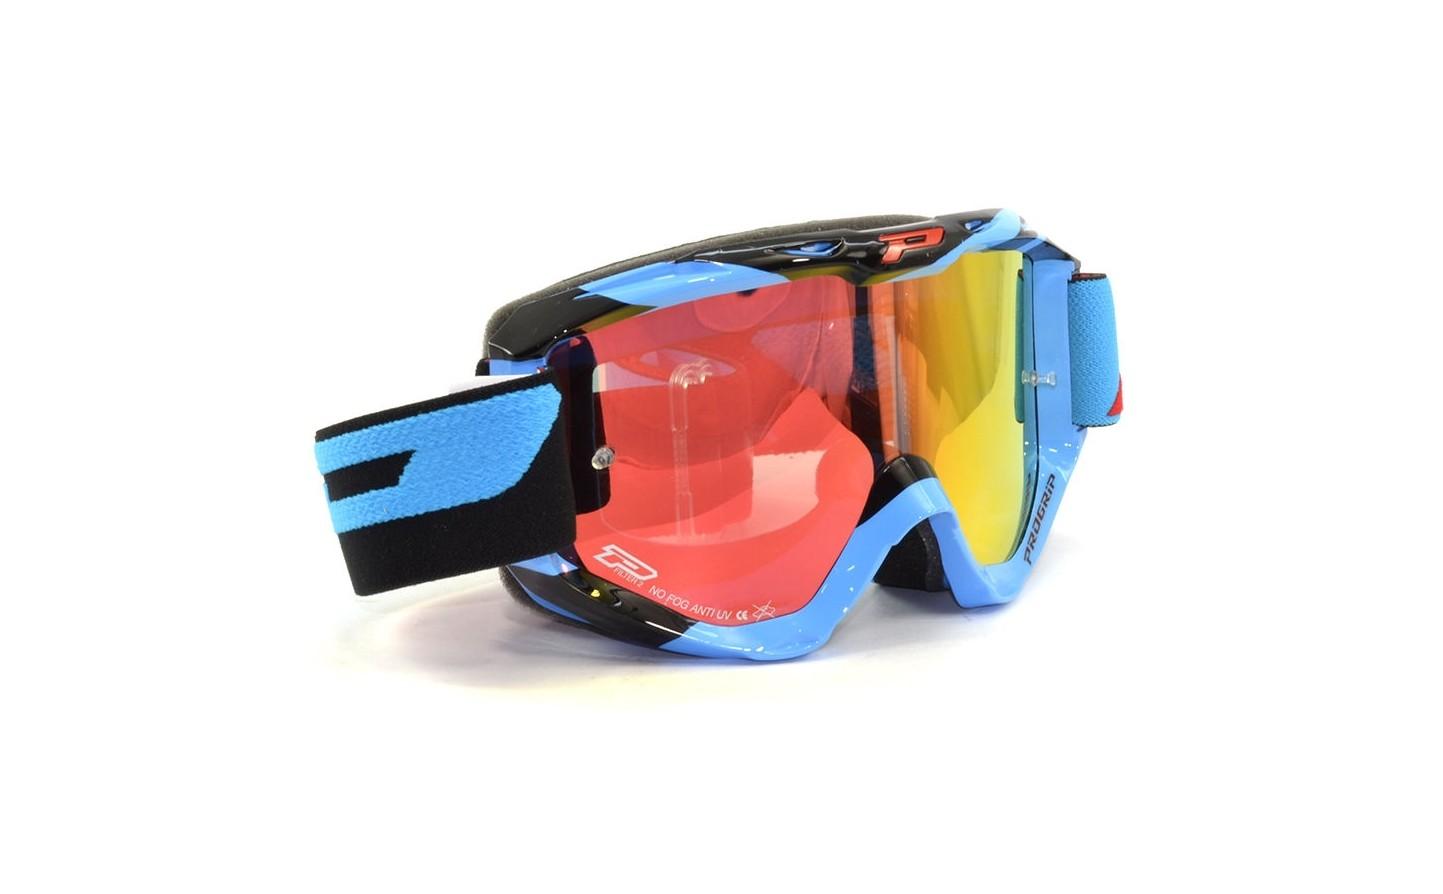 5eda34cd2b Gafas Pro-Grip Cross Ca3450 Fl Multilayer Azul, Lente Espejo 2016 ...